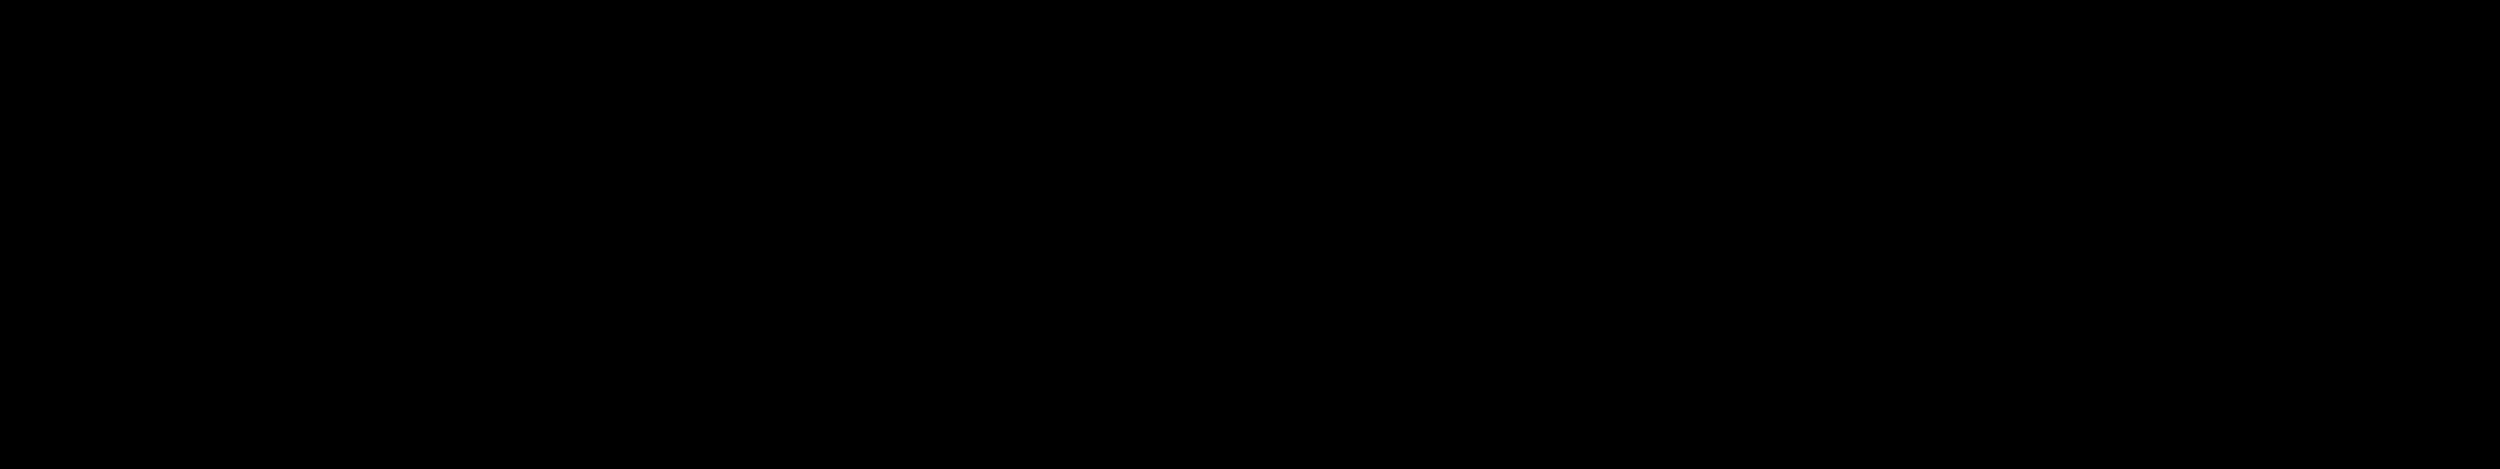 KSM_logo_black.png